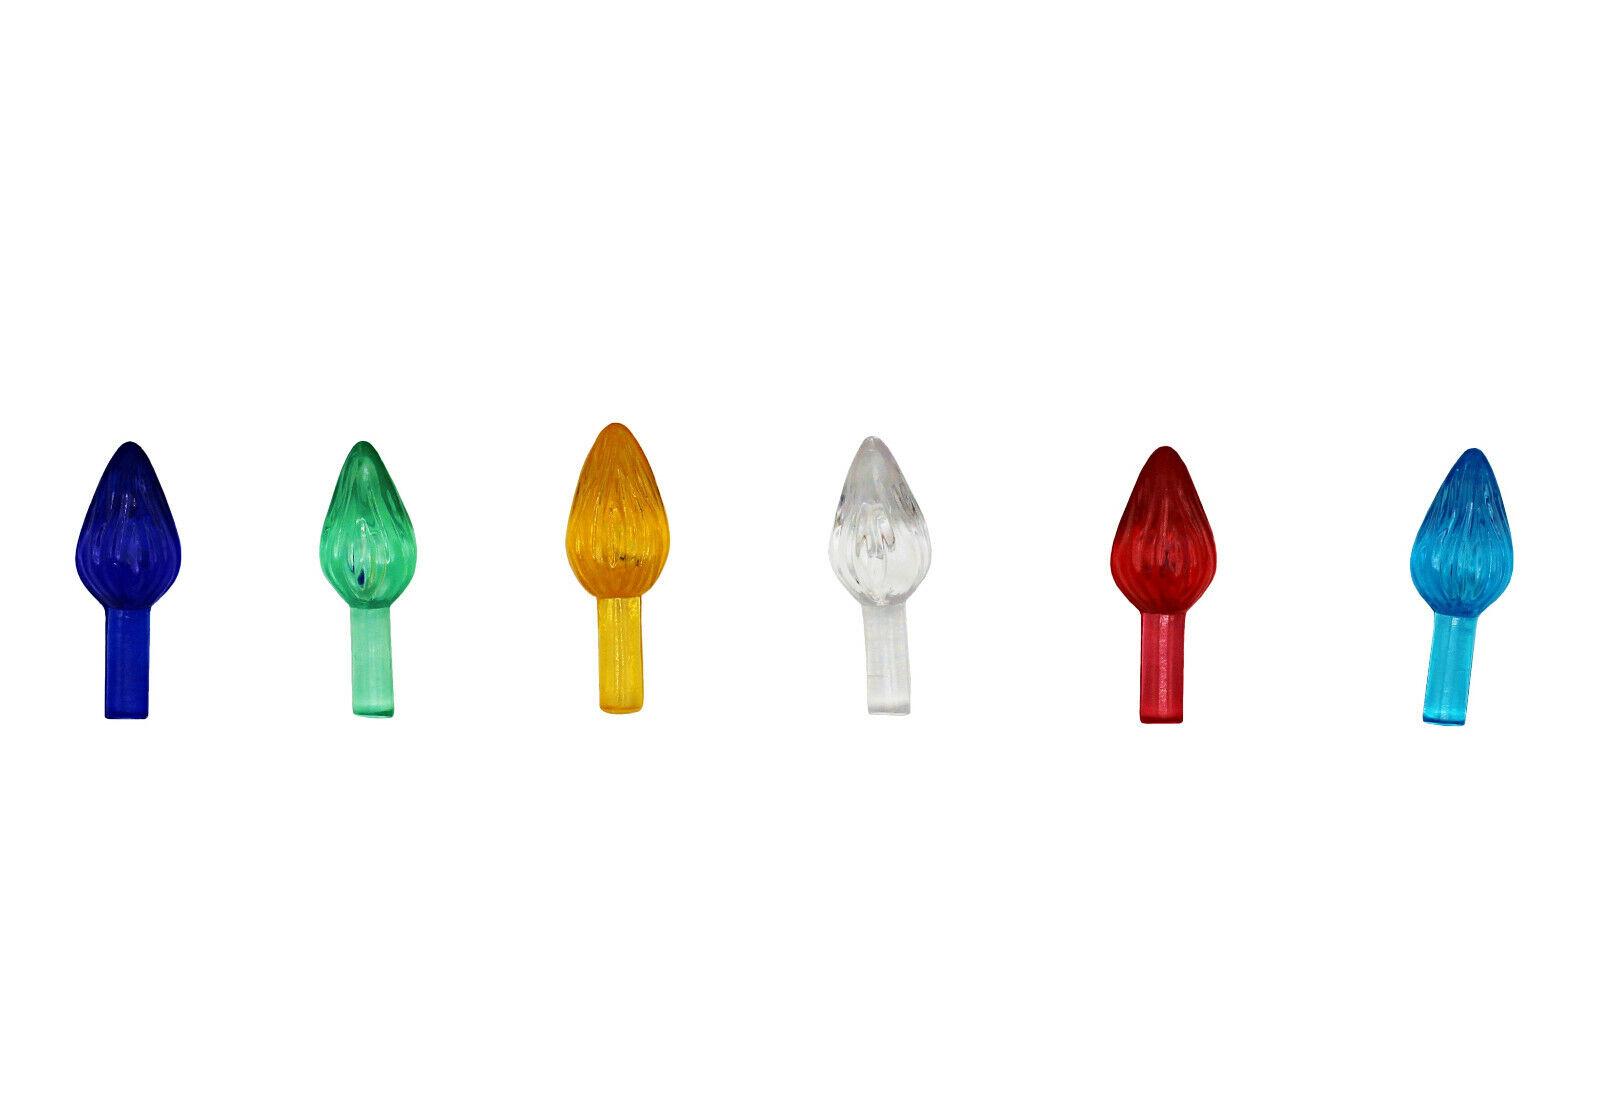 Plastic Lites for Ceramic Christmas Trees, Small Twist, Multi Color, 144 Pcs Christmas Trees